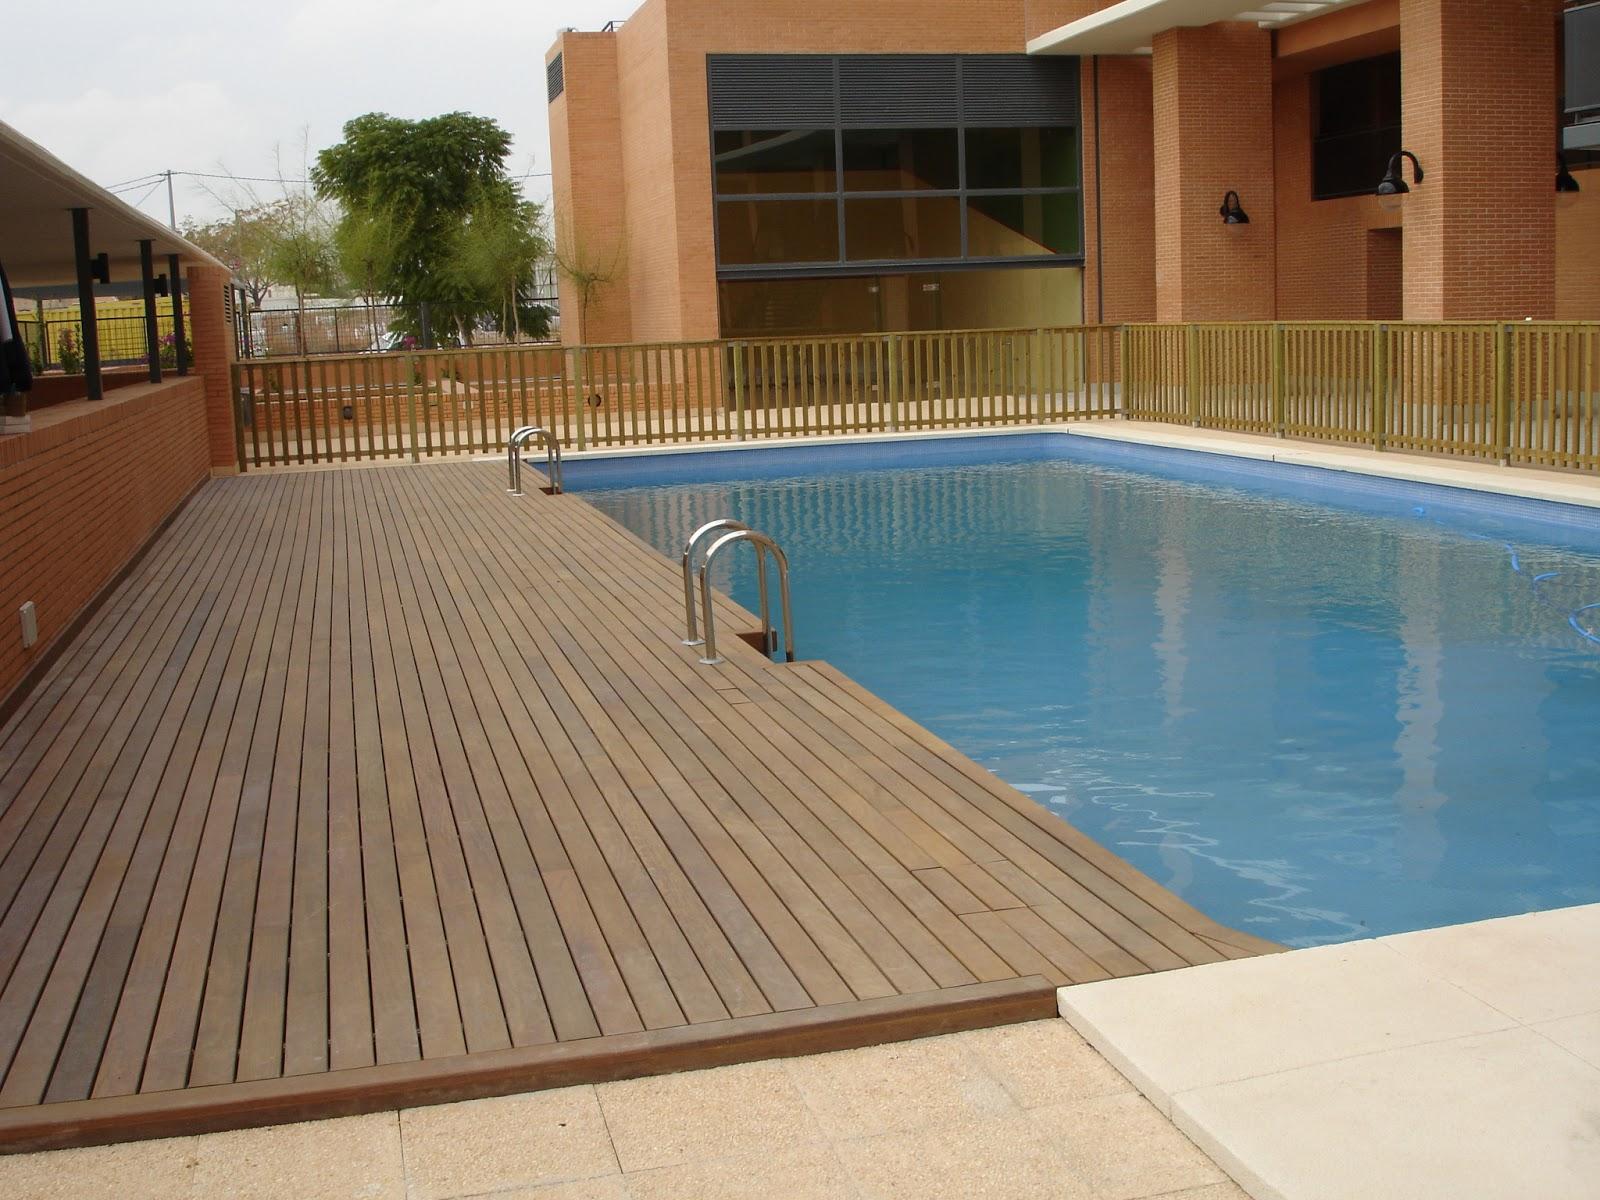 Indagua sauco coronaci n piscina - Baldosas exterior antideslizantes ...